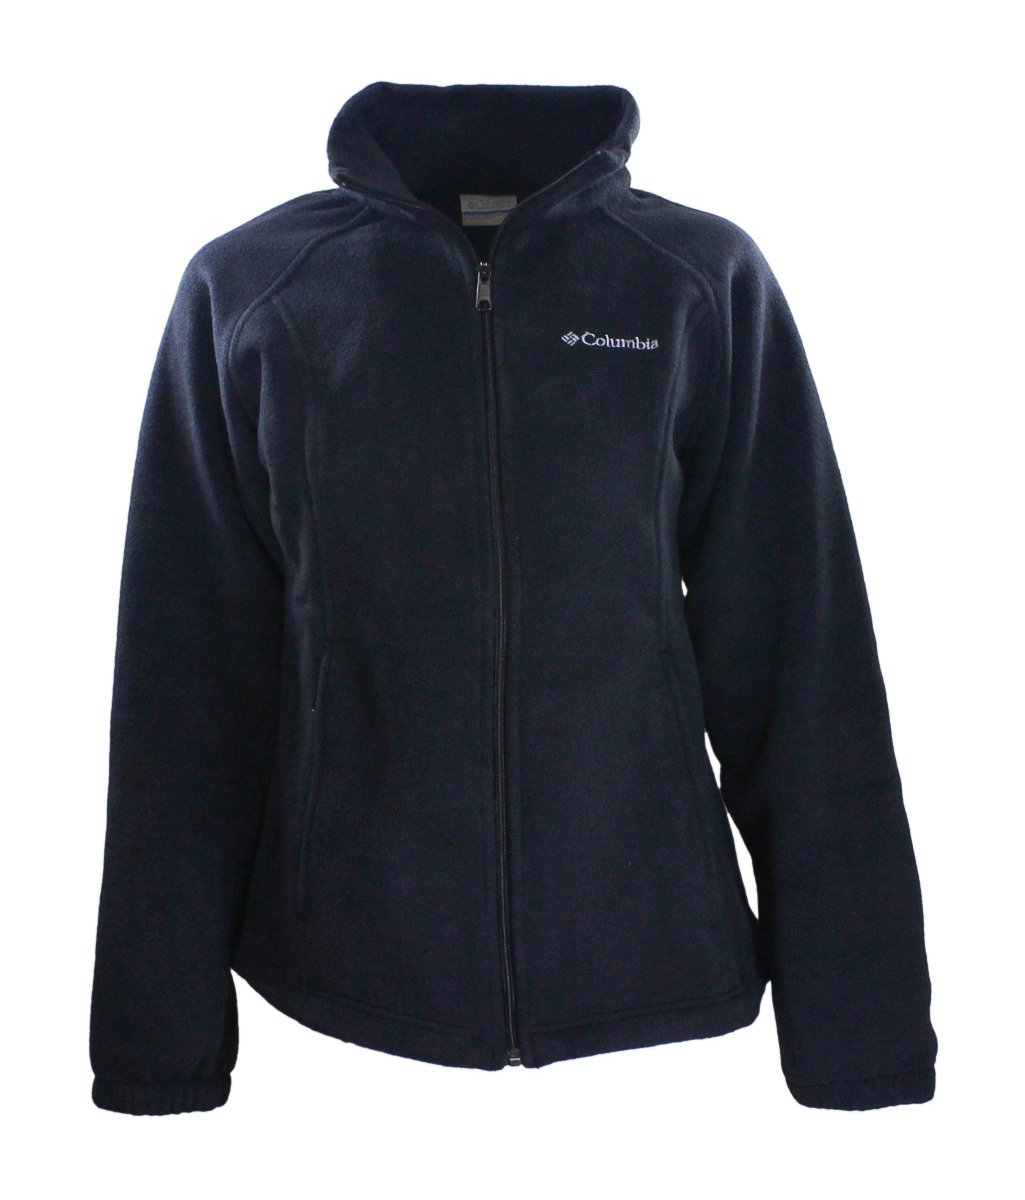 Columbia Women's Sawyer Rapids 2.0 Fleece Jacket-Black-Medium by Columbia